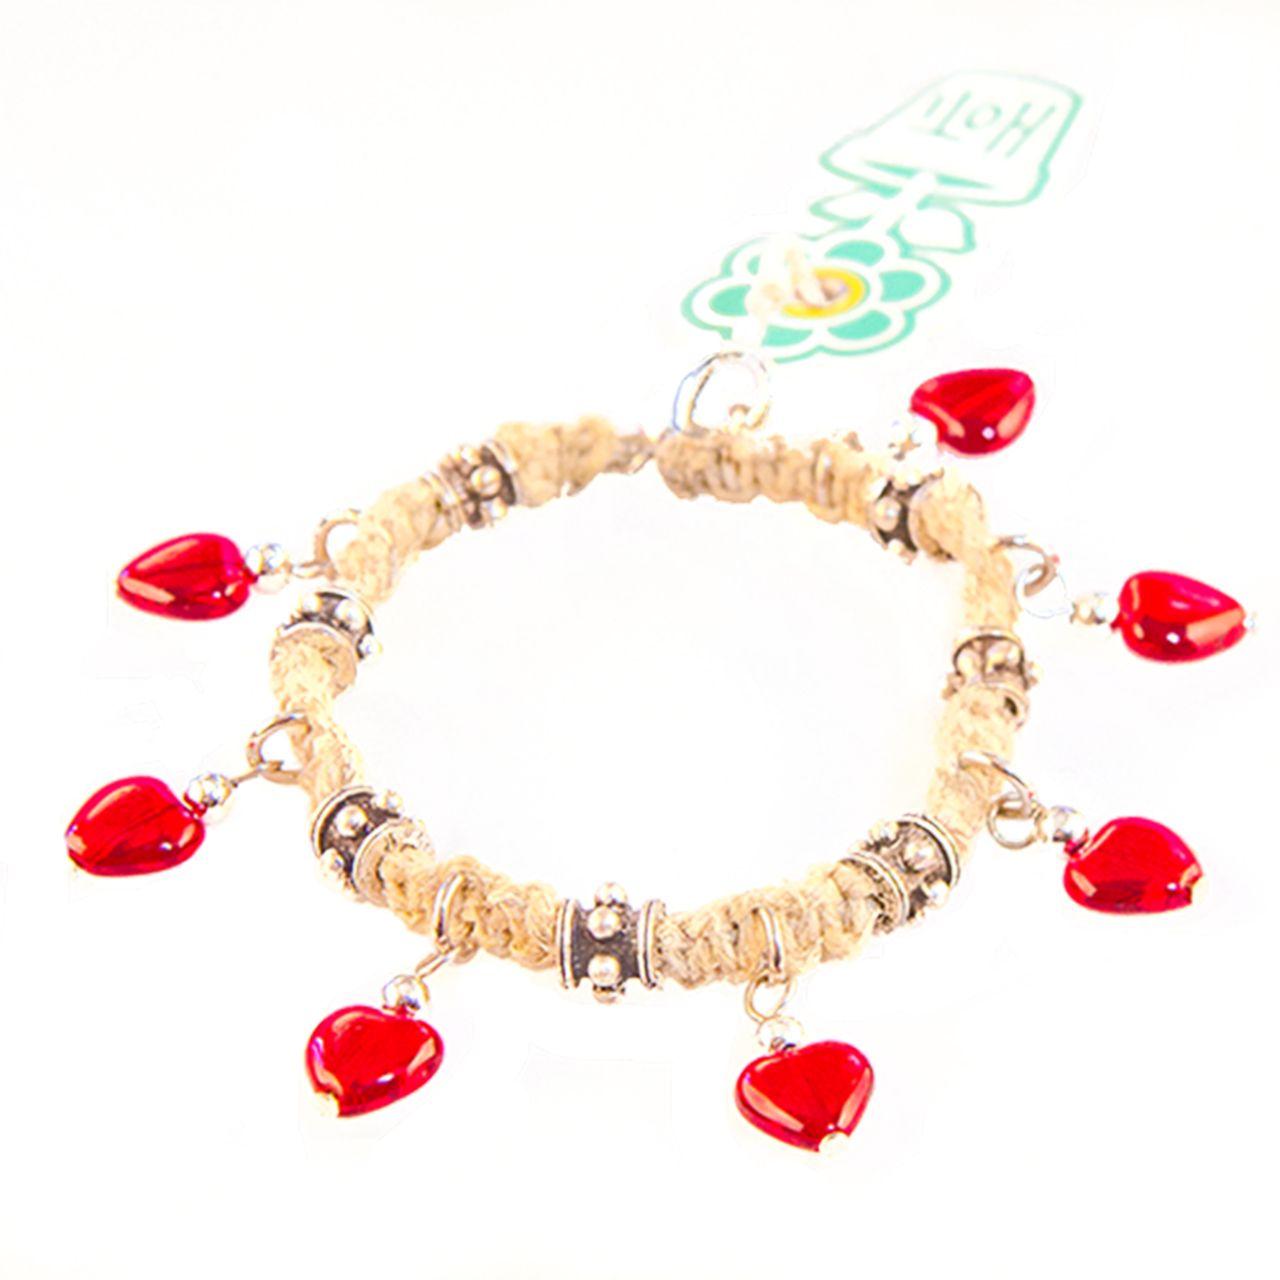 Sunshine On A Cloudy Day  Hoti Hemp I Heart Rock Natural Red Handmade Charm  Bracelet